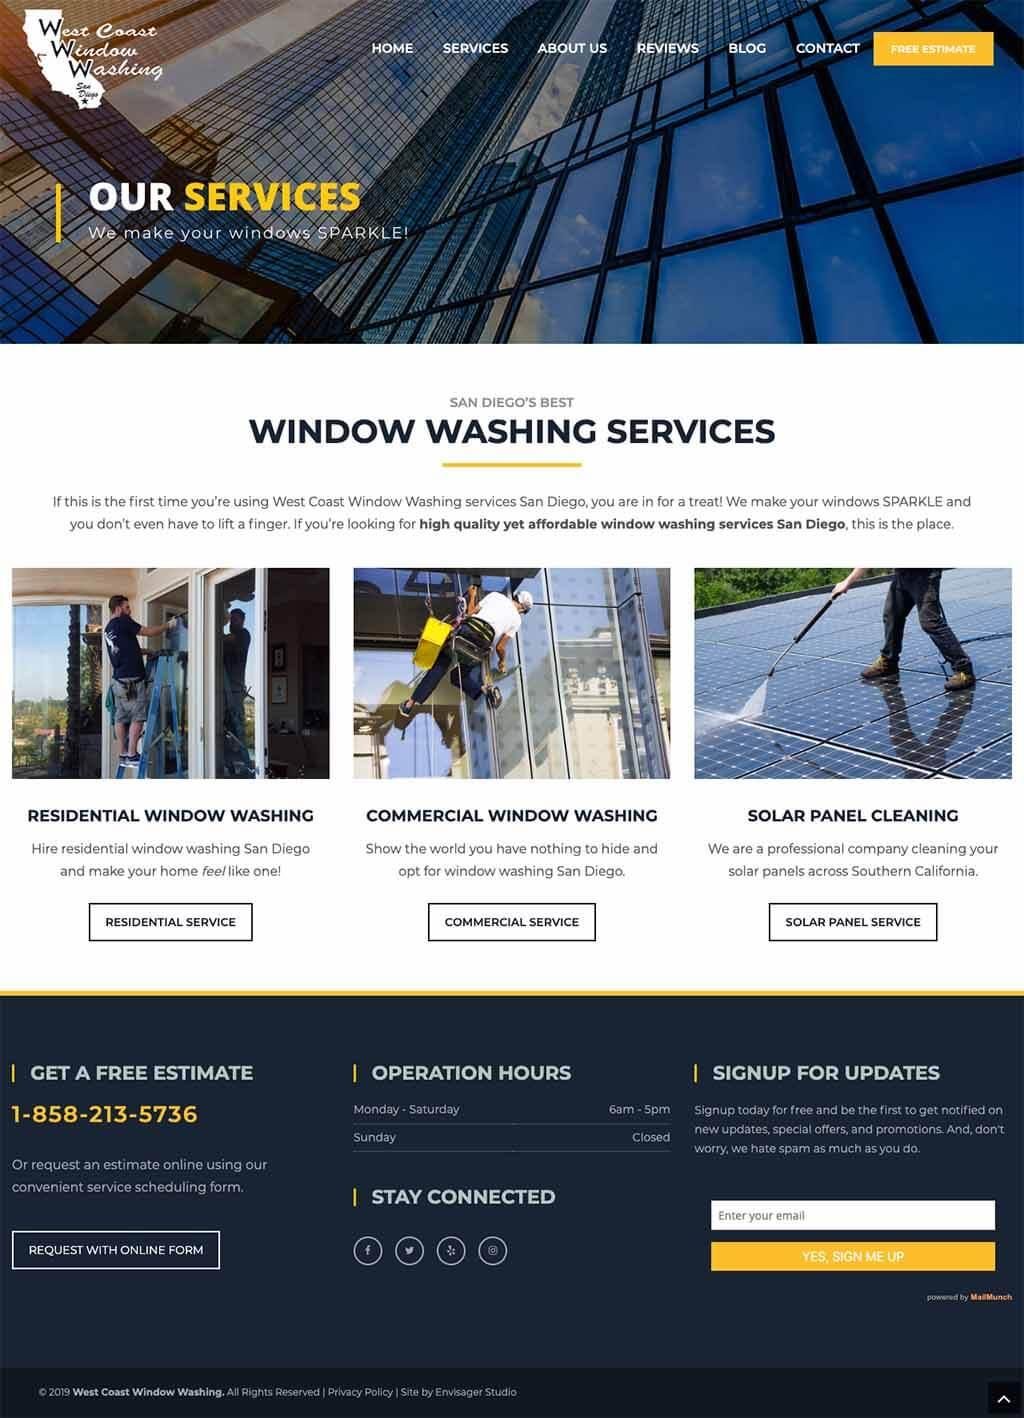 West Coast Window Washing San Diego